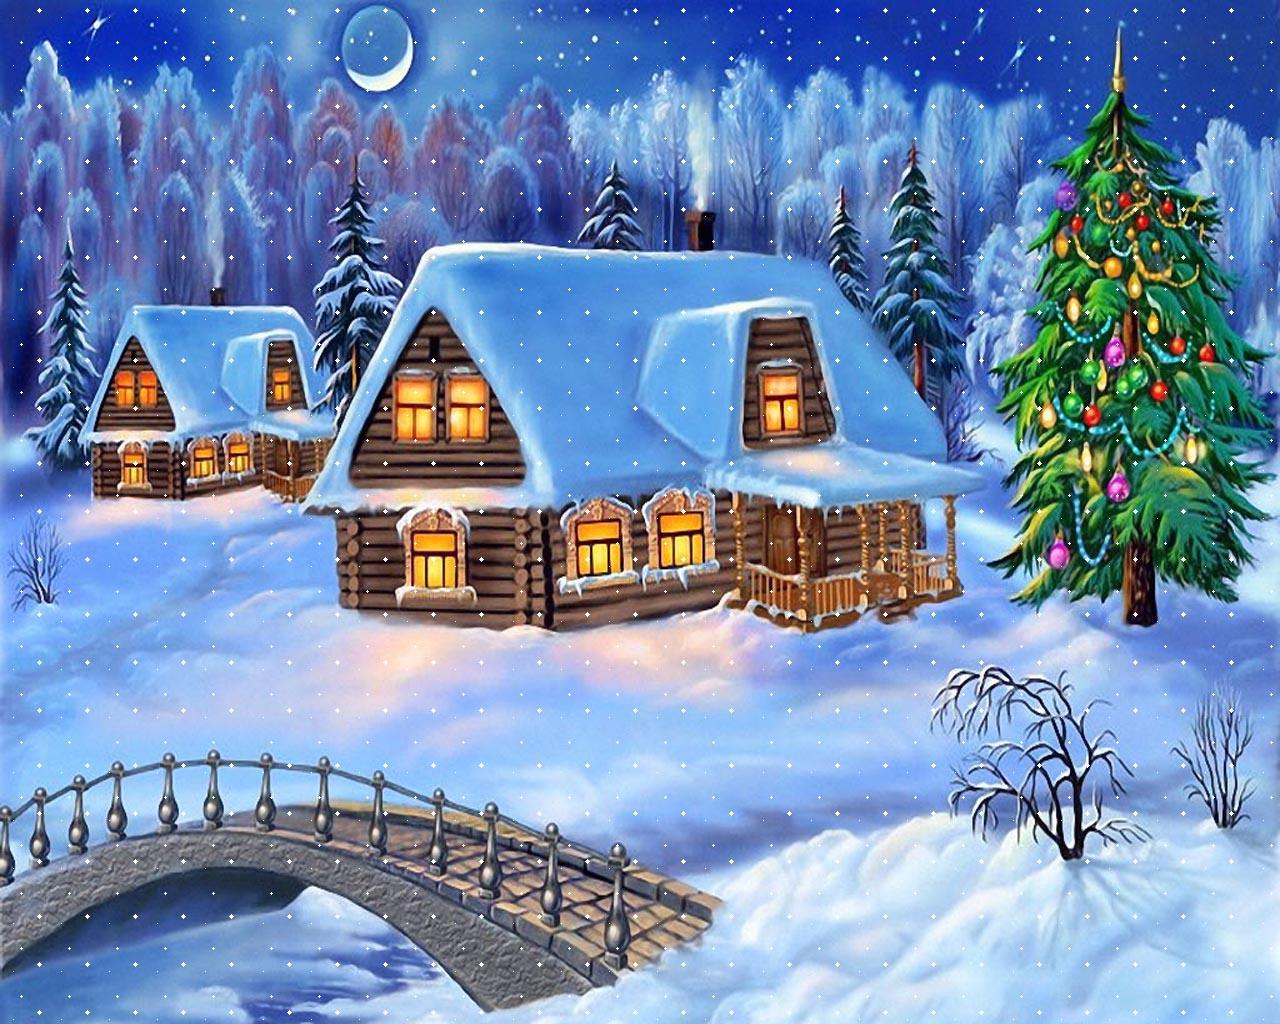 Abstract Christmas Desktop Wallpaper 1280 9747 Hd Wallpapers 1280x1024